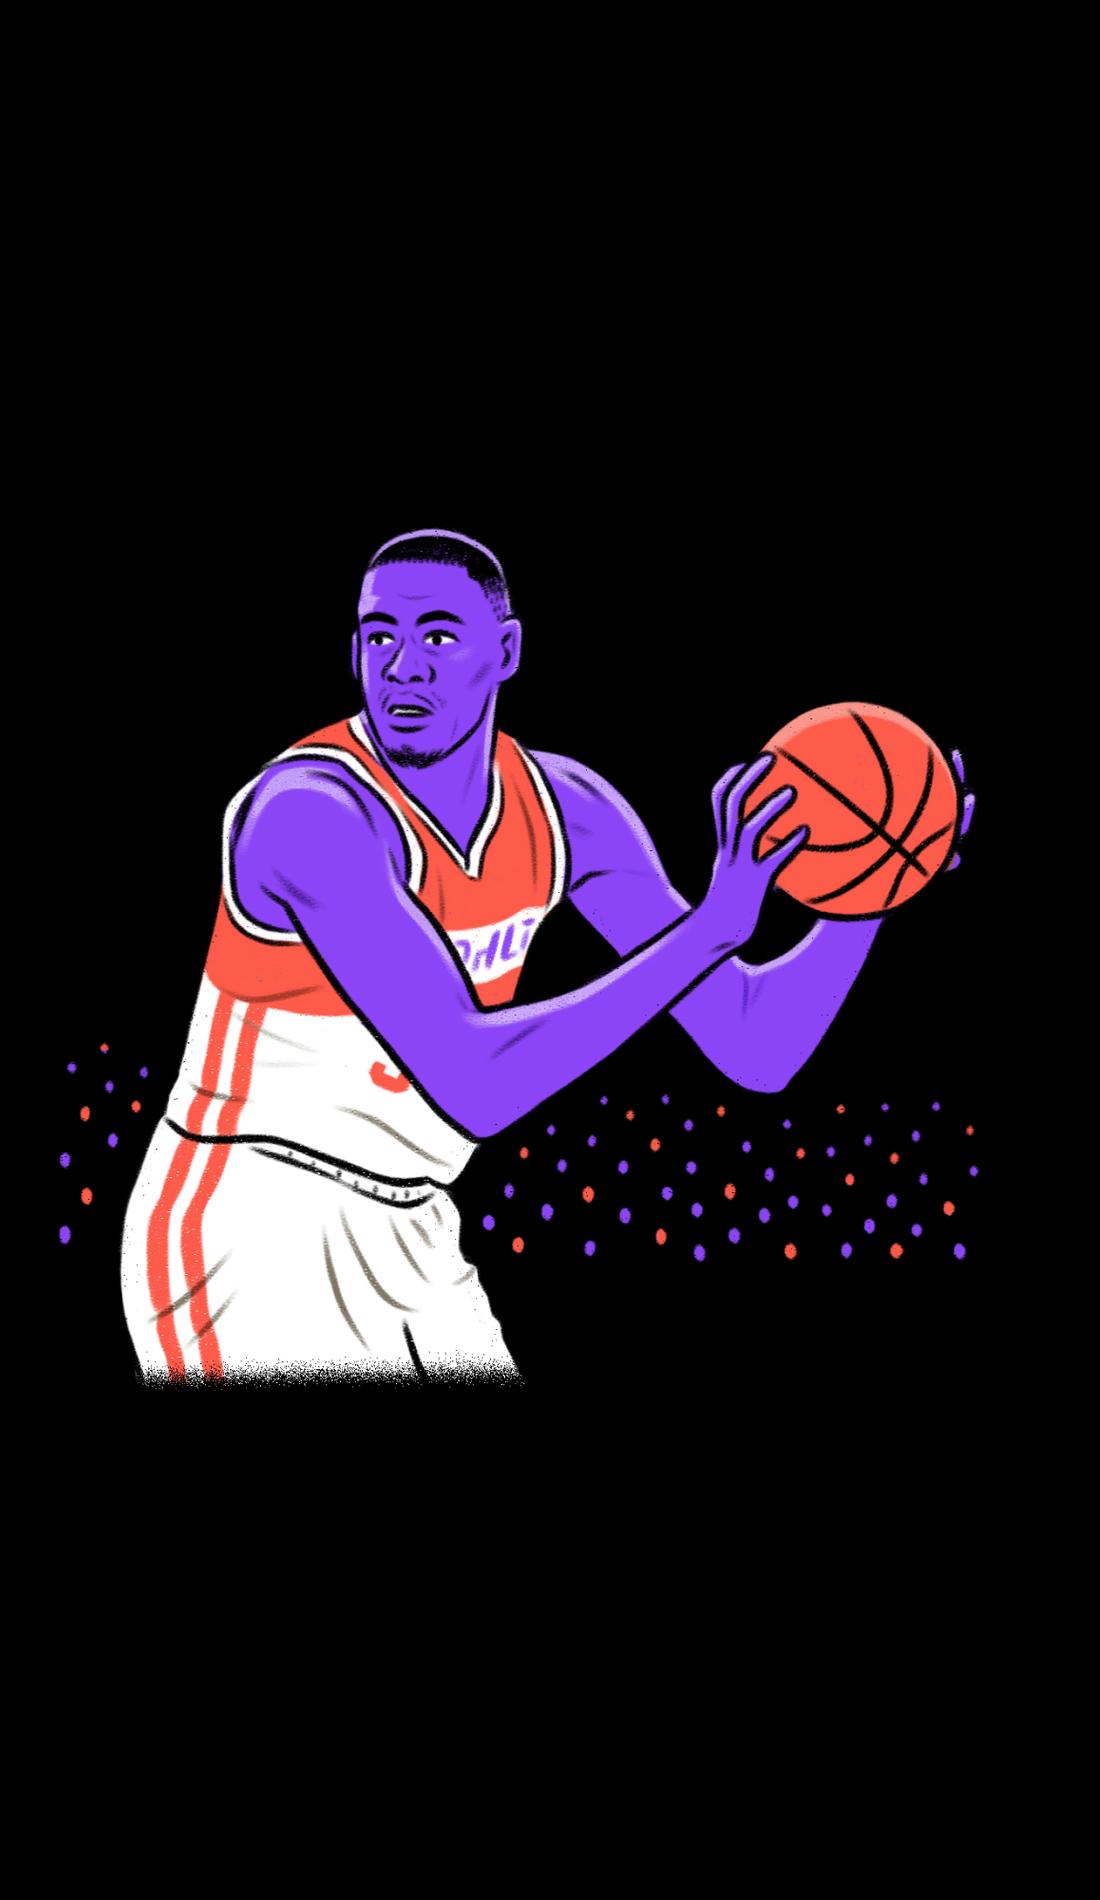 A IUPUI Jaguars Basketball live event